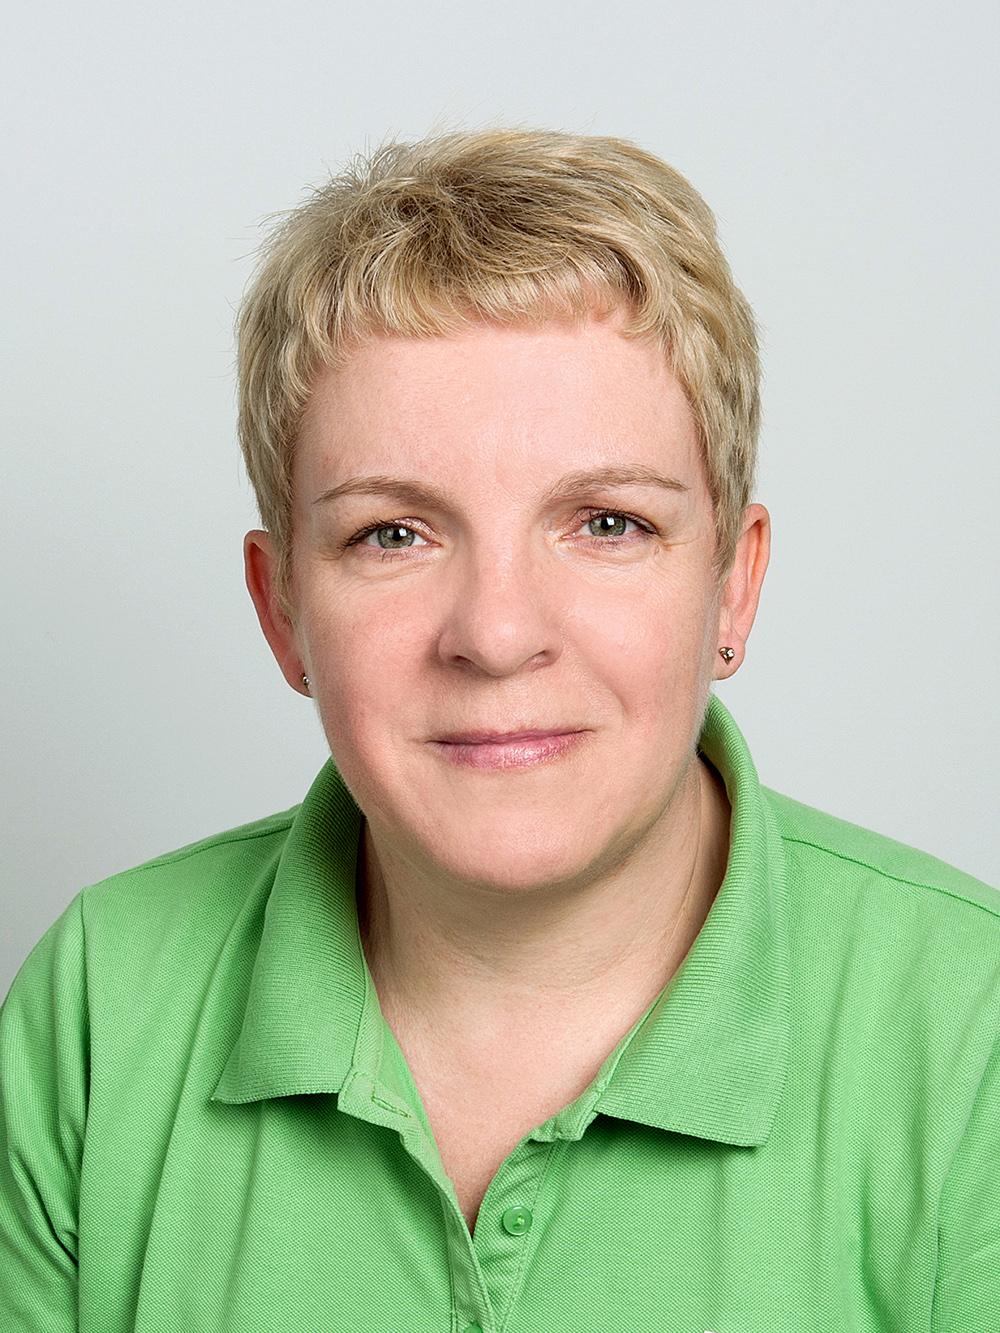 Manuela Sauerhering